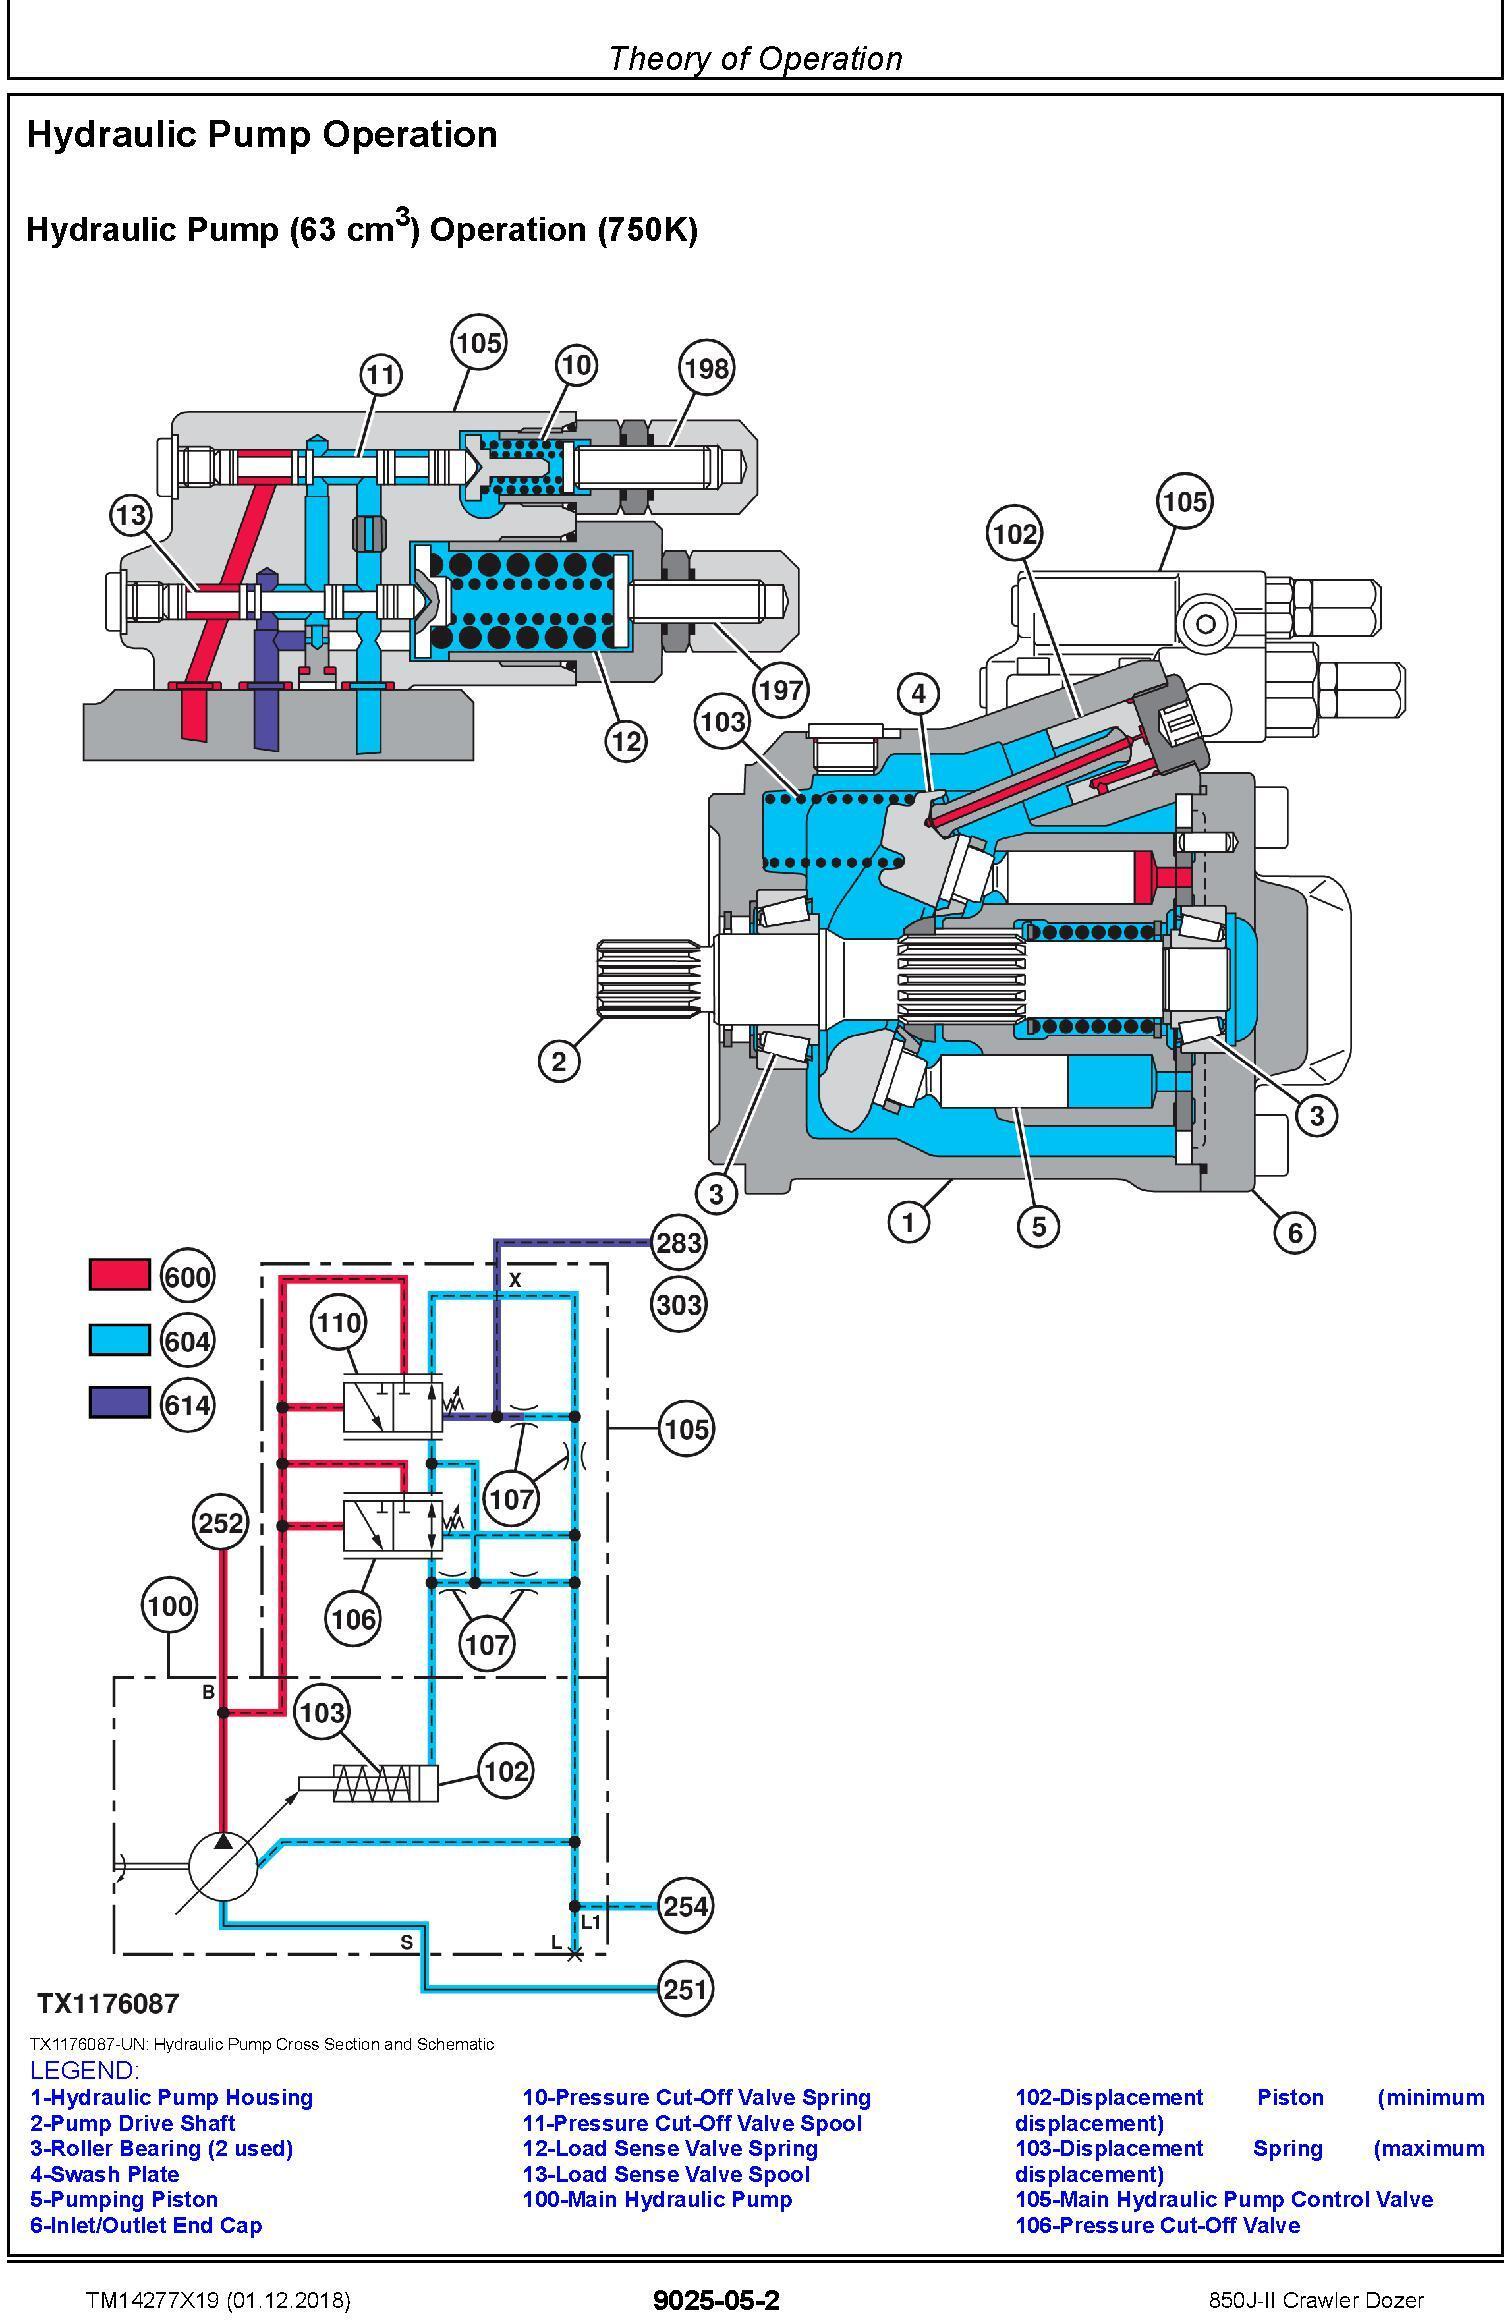 John Deere 850J-II (SN. D000001-) Crawler Dozer Operation & Test Technical Manual (TM14277X19) - 2